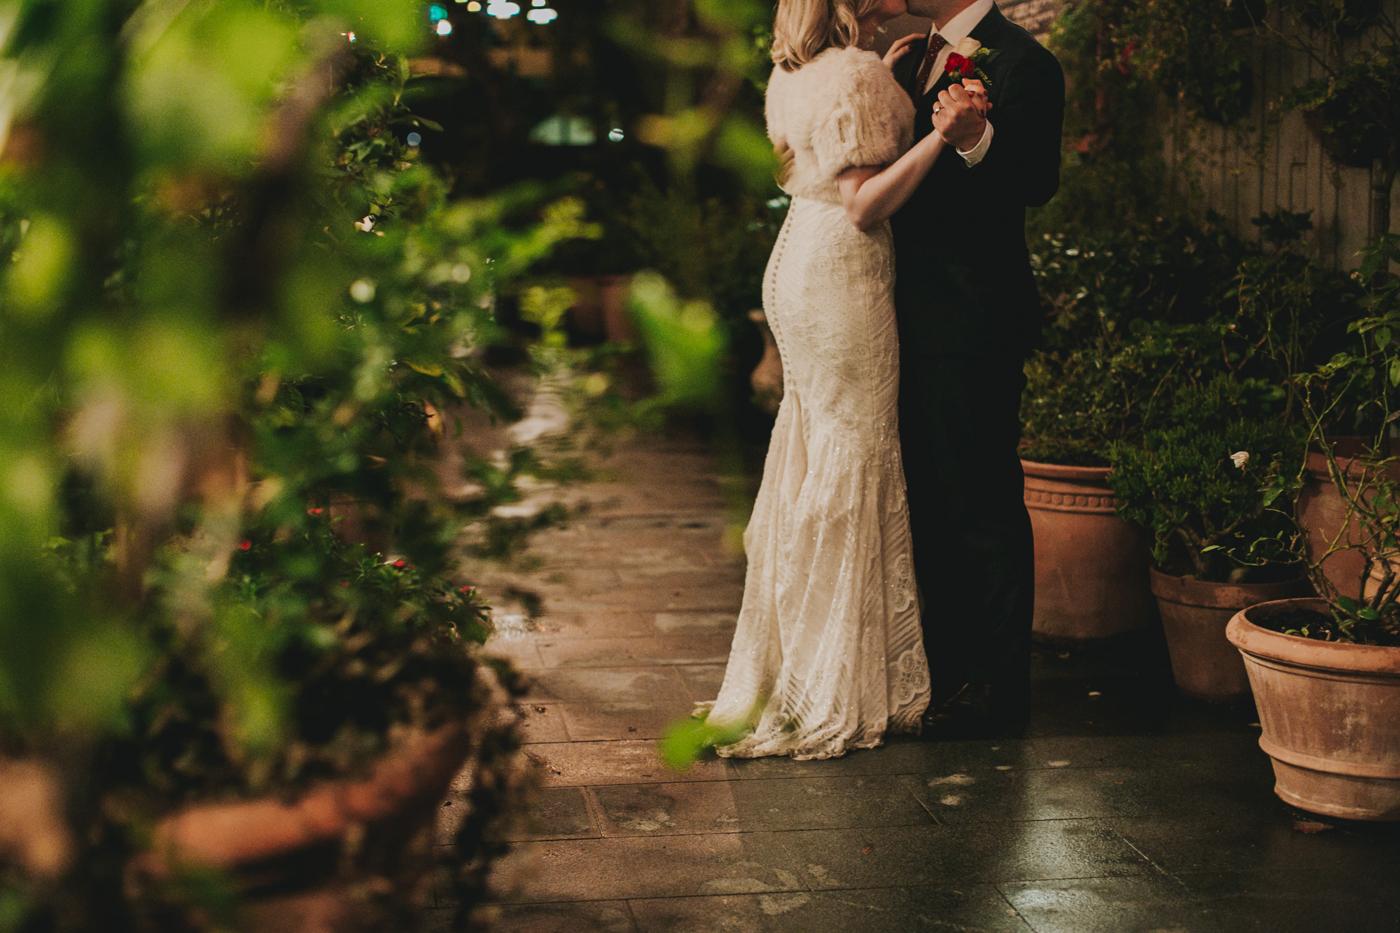 Jo & Tom Wedding - The Grounds of Alexandria - Samantha Heather Photography-332.jpg